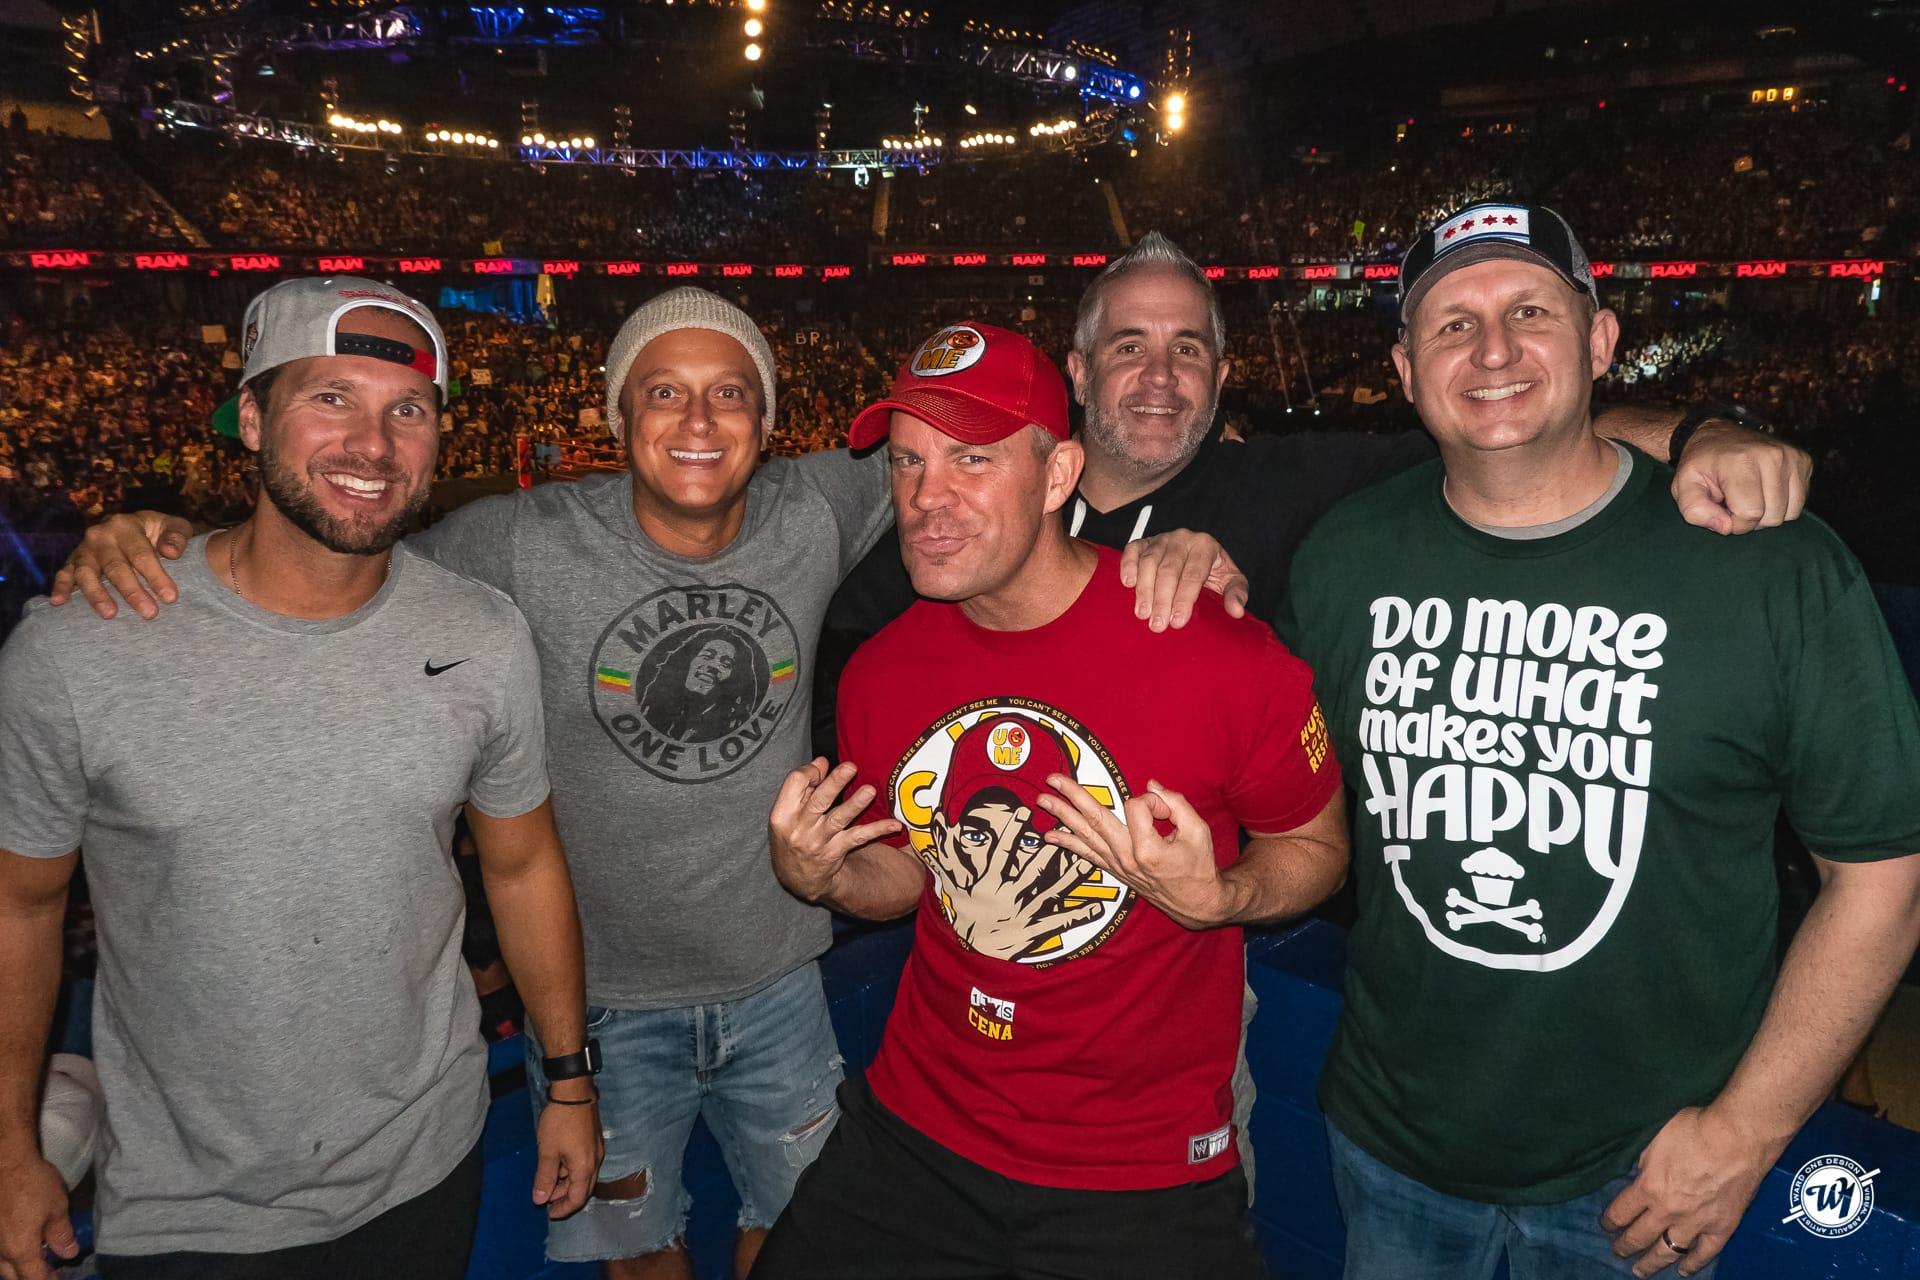 WWE Monday Night Raw • October 8th, 2018 • Chicago